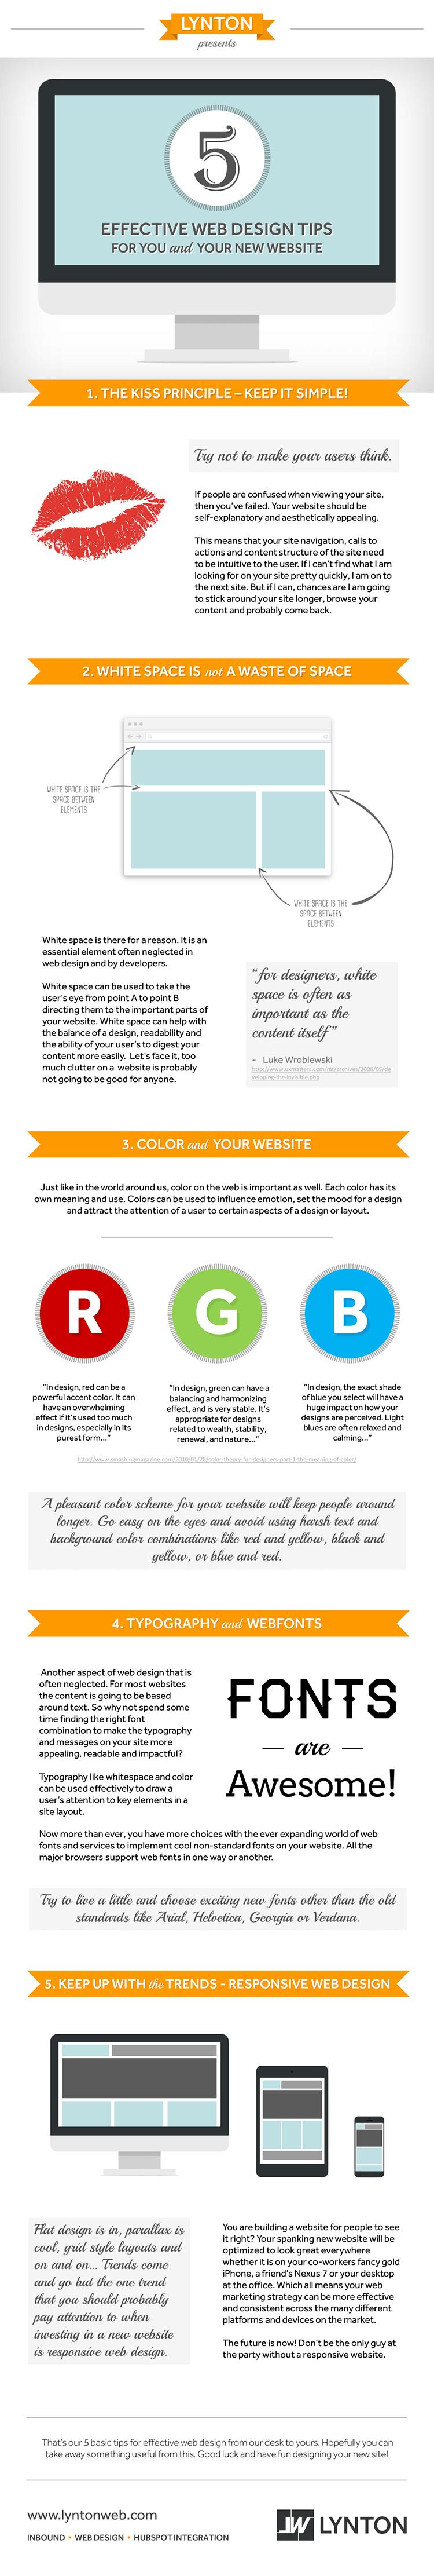 5_effective_web_design_tips_image_(4)